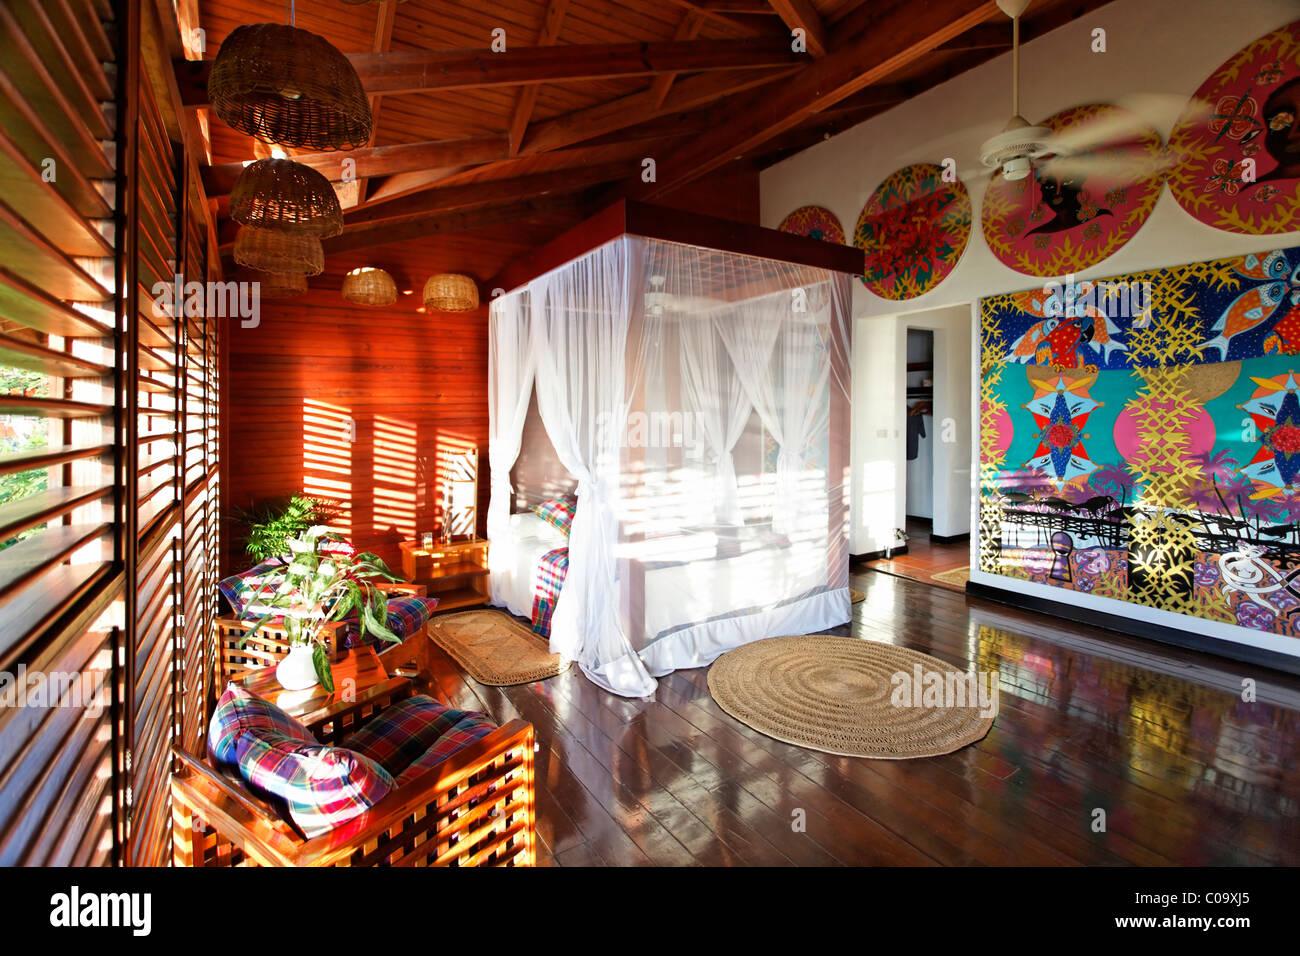 Hotelroom avec illustrations originales de Claude Sandoz, Luxury Hotel Anse Chastanet Resort, LCA, Sainte-Lucie, Photo Stock